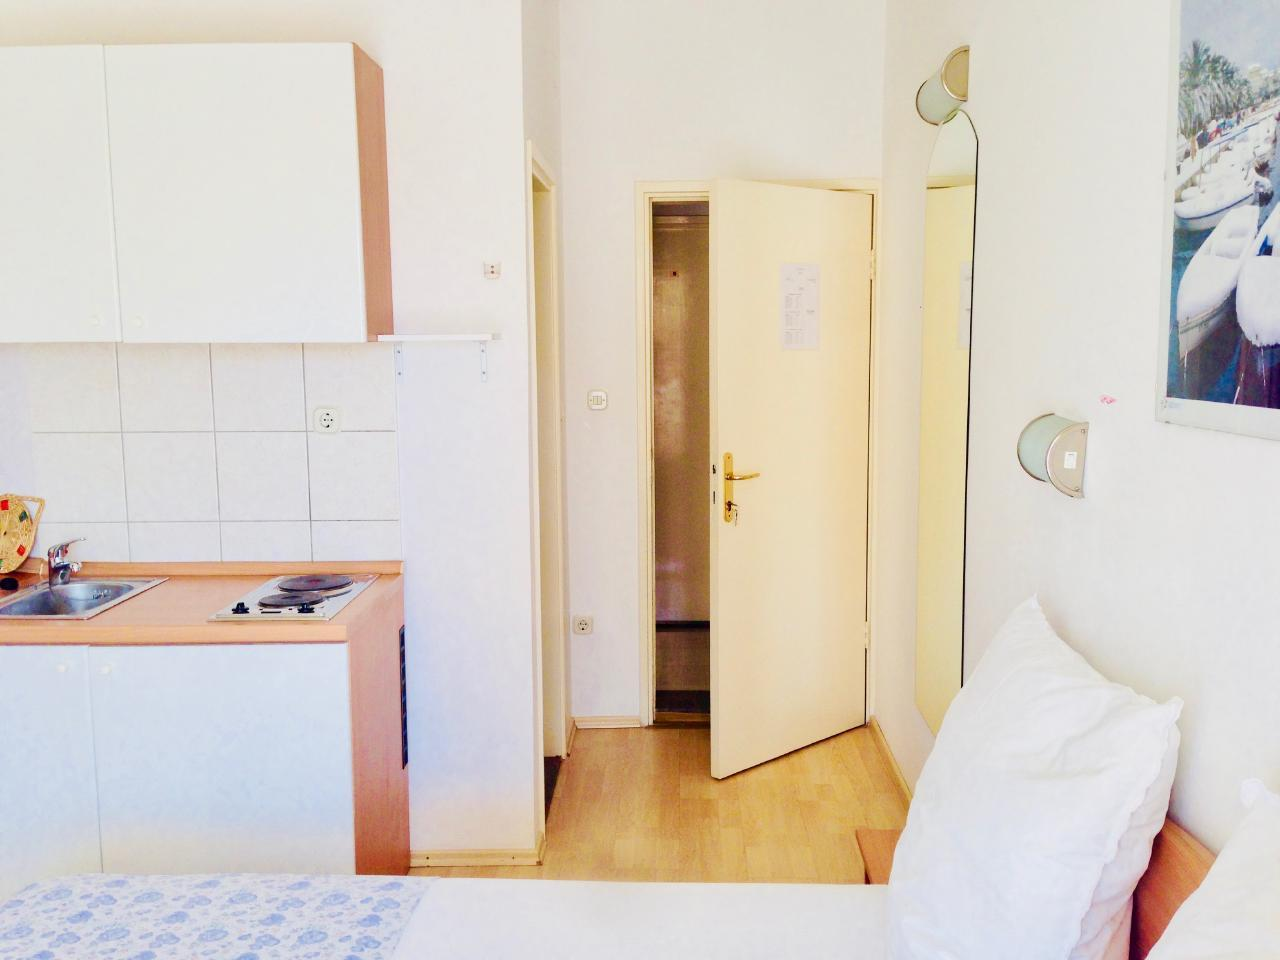 Ferienwohnung Apartmenthaus Ruza 3 - Studio (98391), Kaštel Štafilić, , Dalmatien, Kroatien, Bild 5